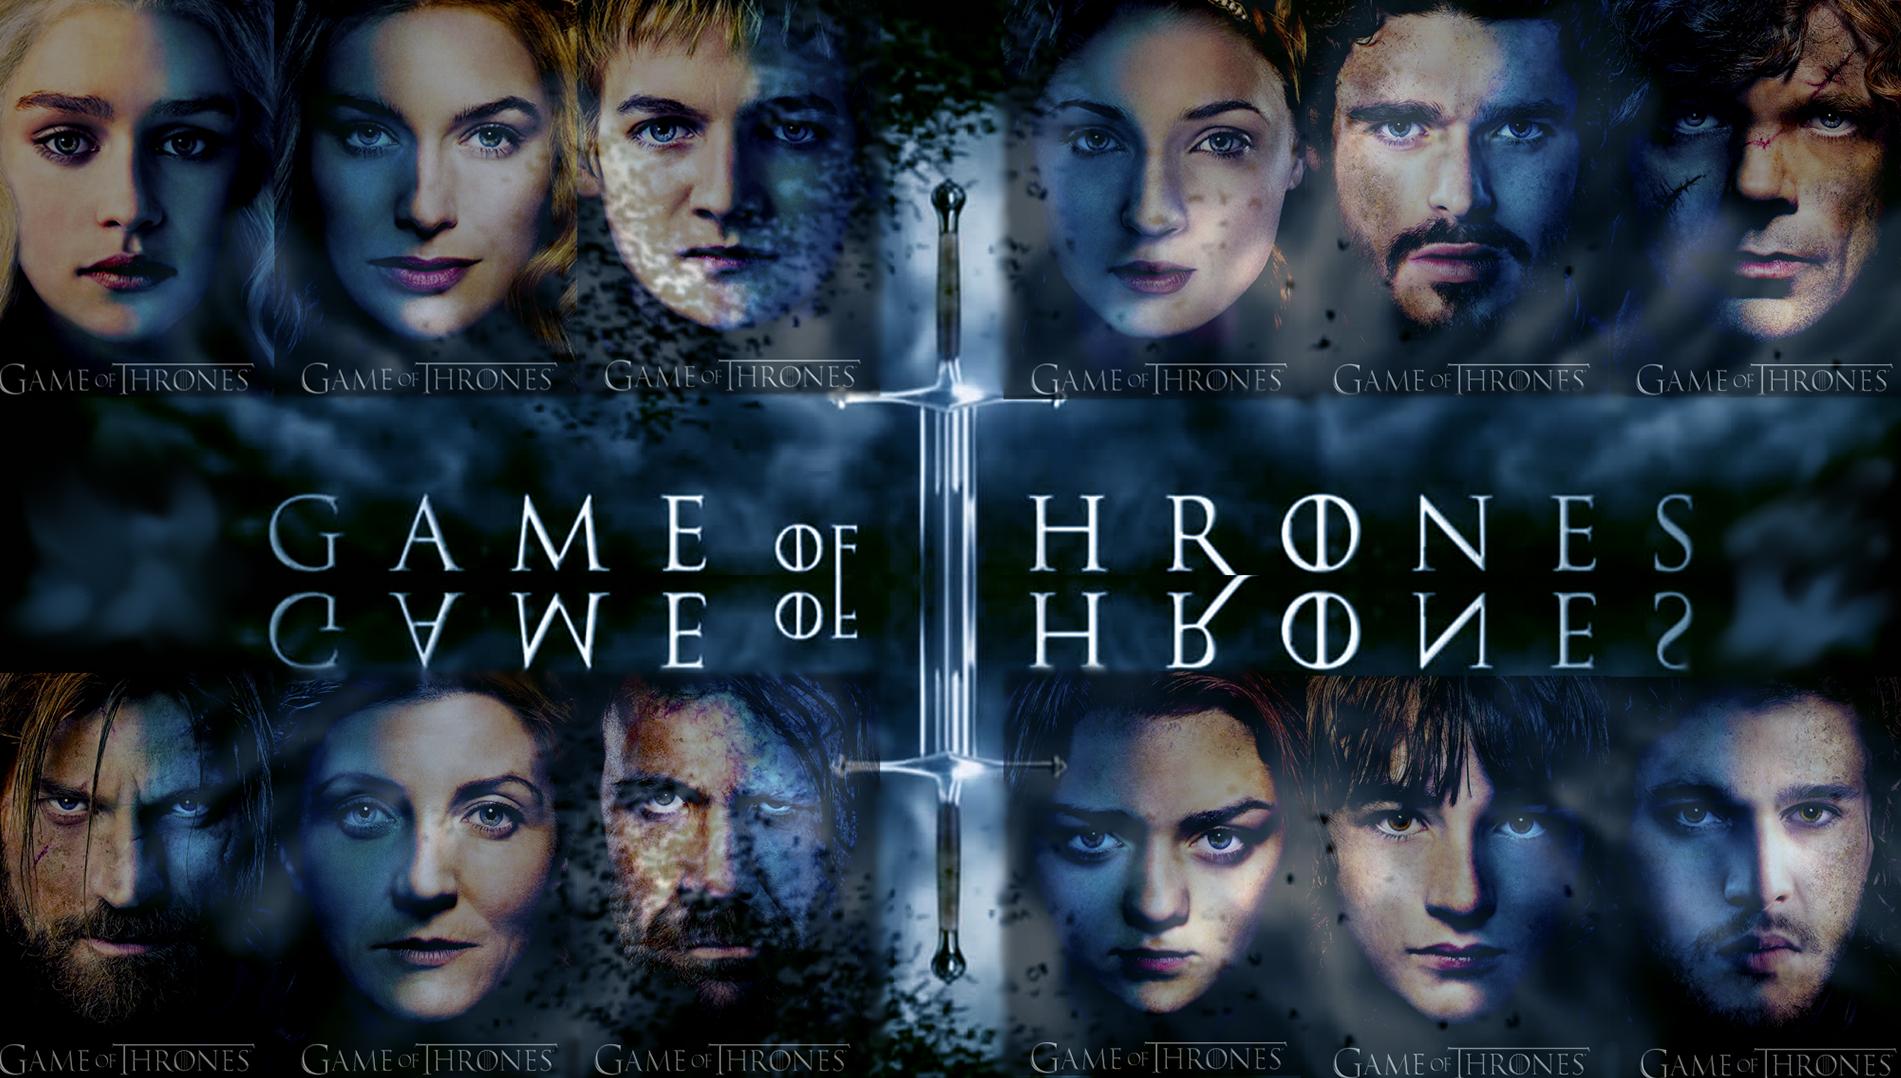 game of thrones season 7 episode 2 hd download